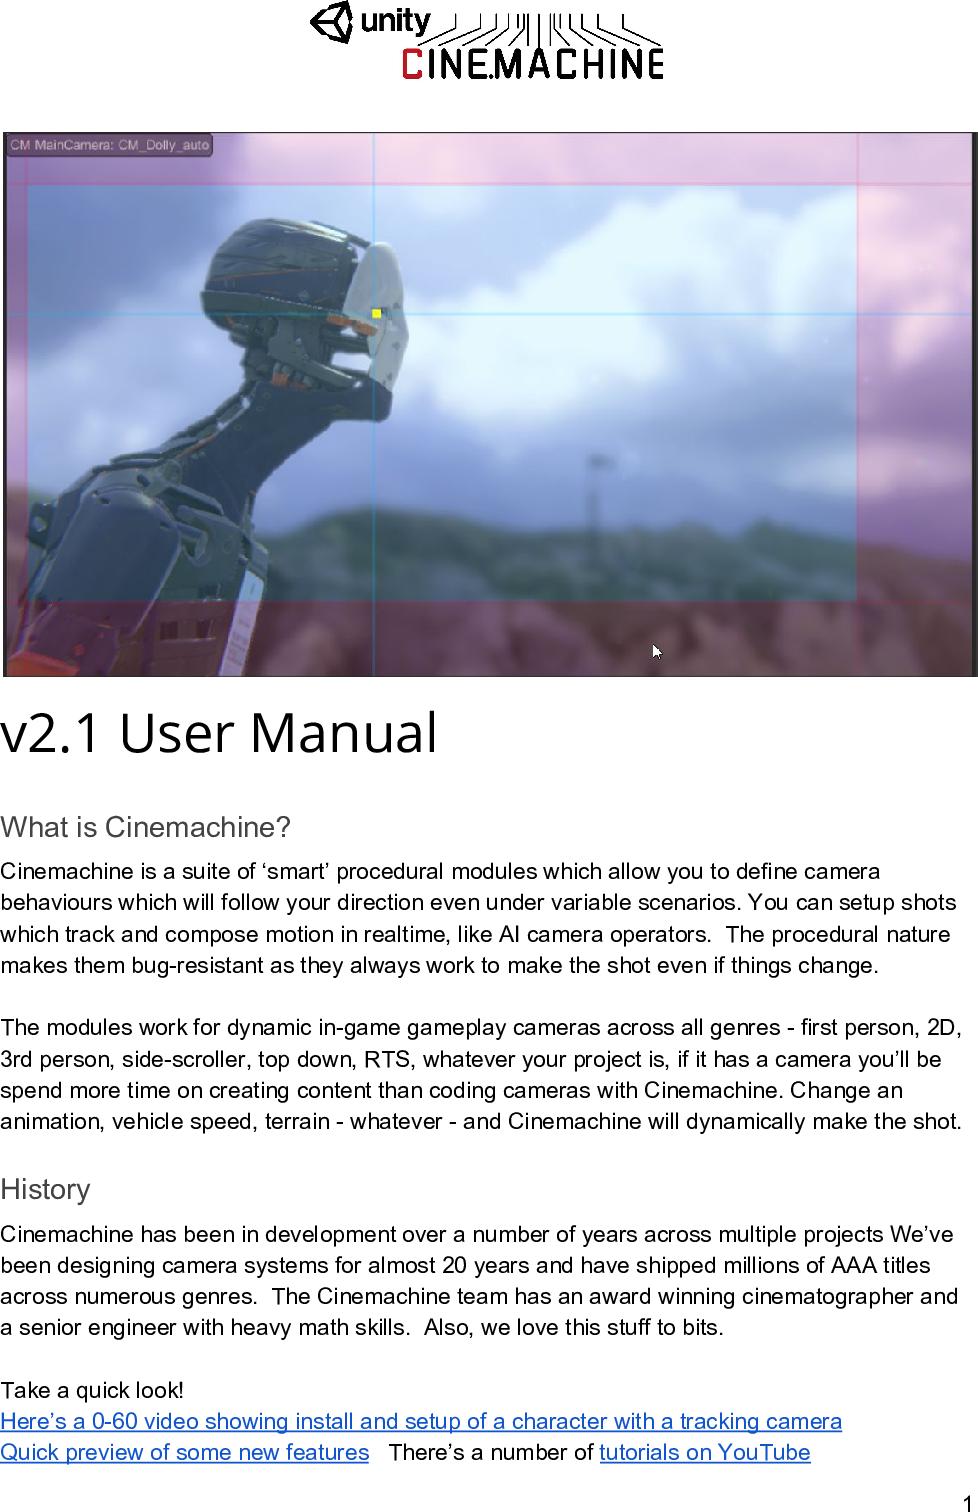 Cinemachine User Manual